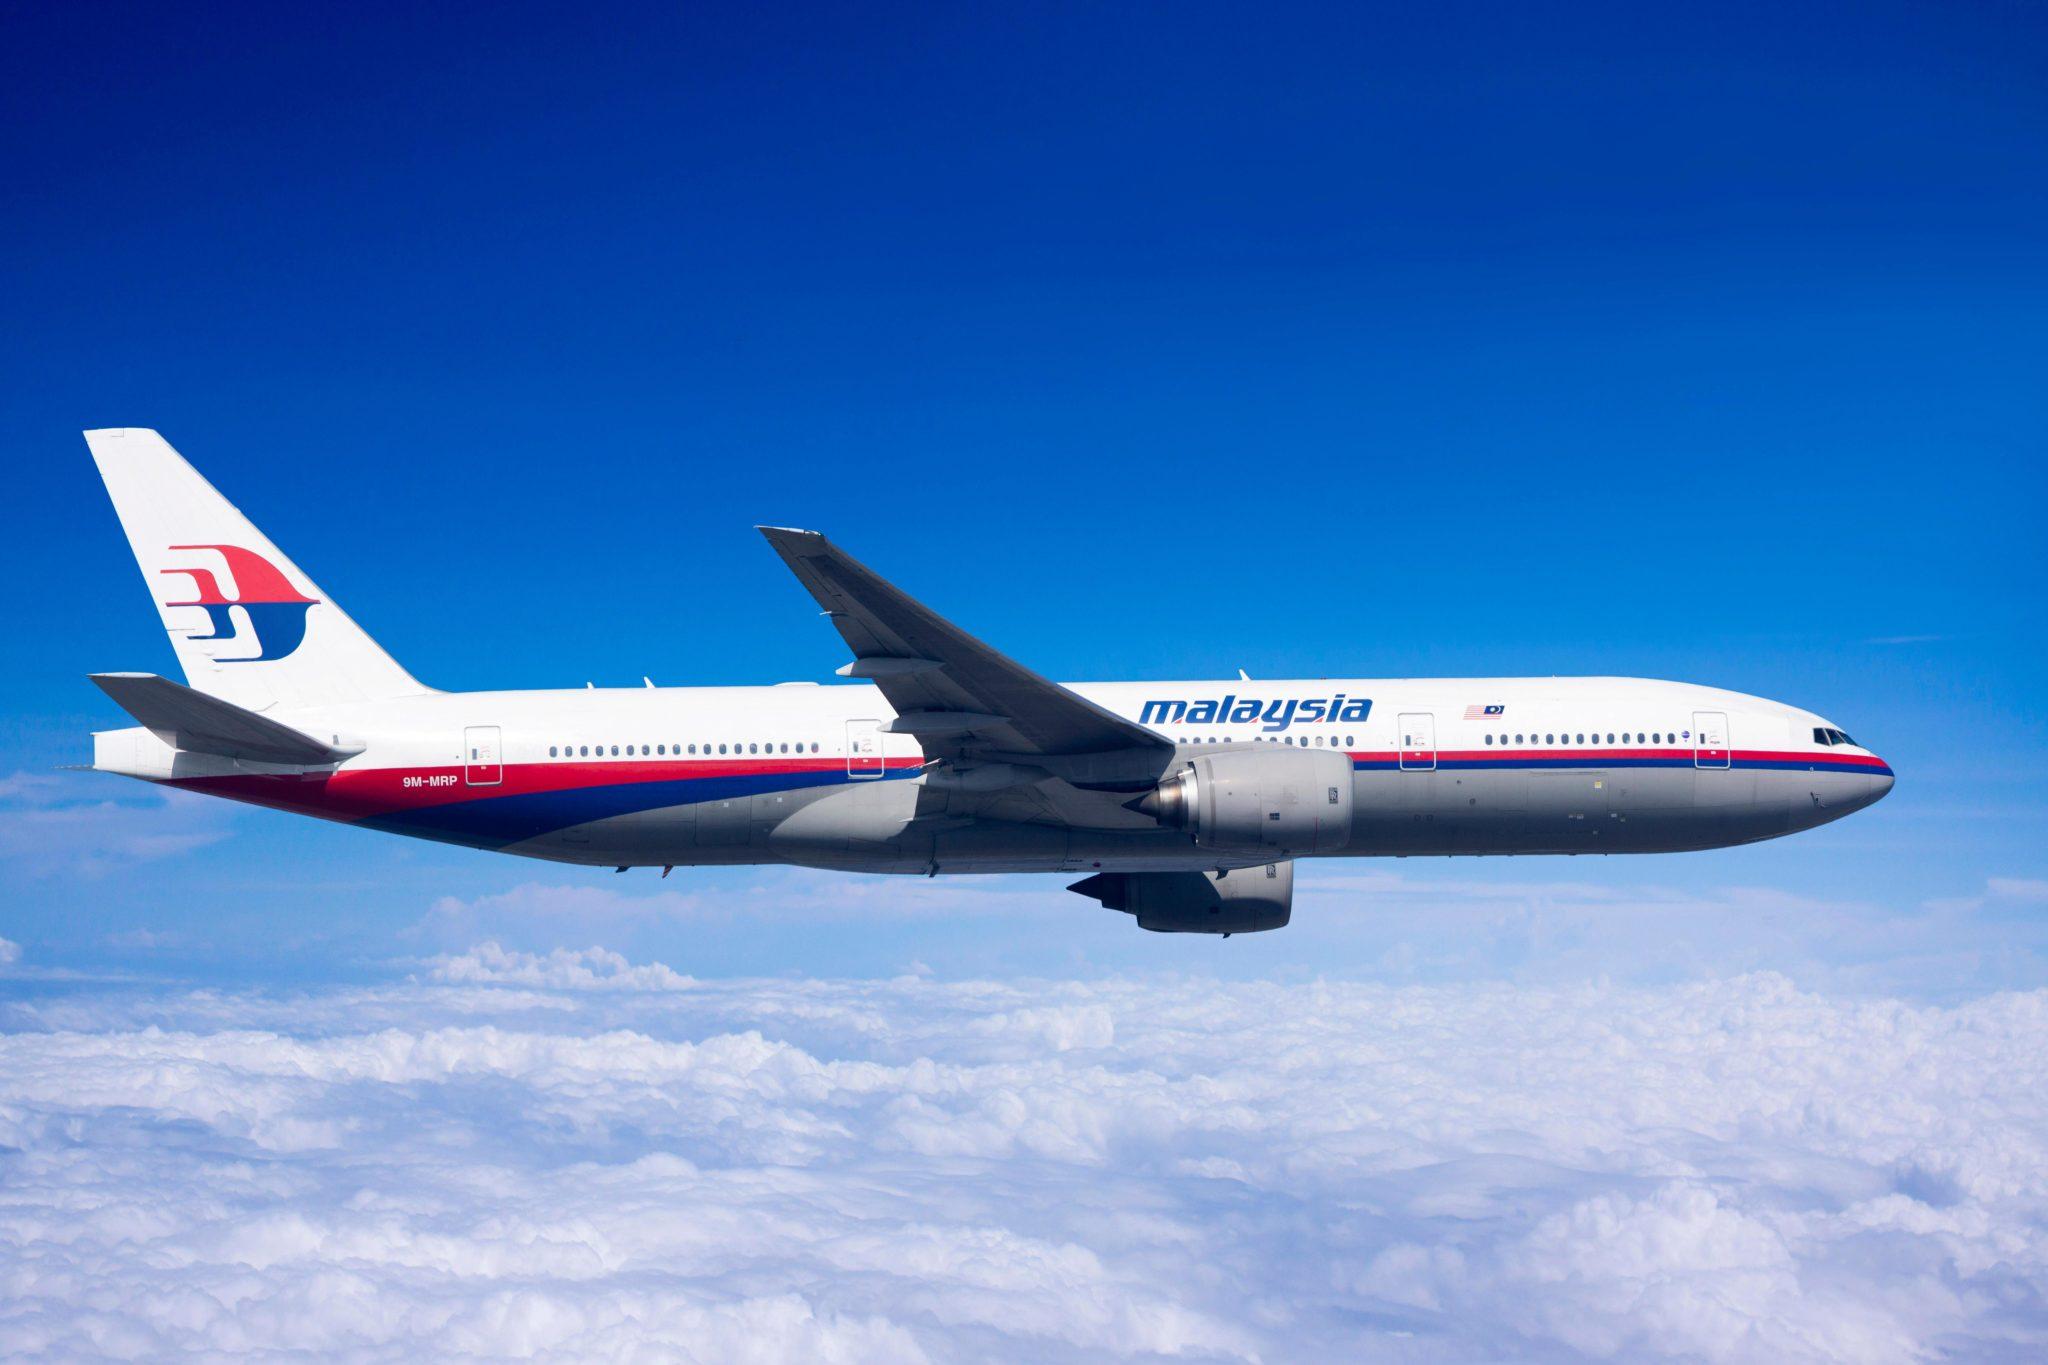 Malaysia Air flight 370